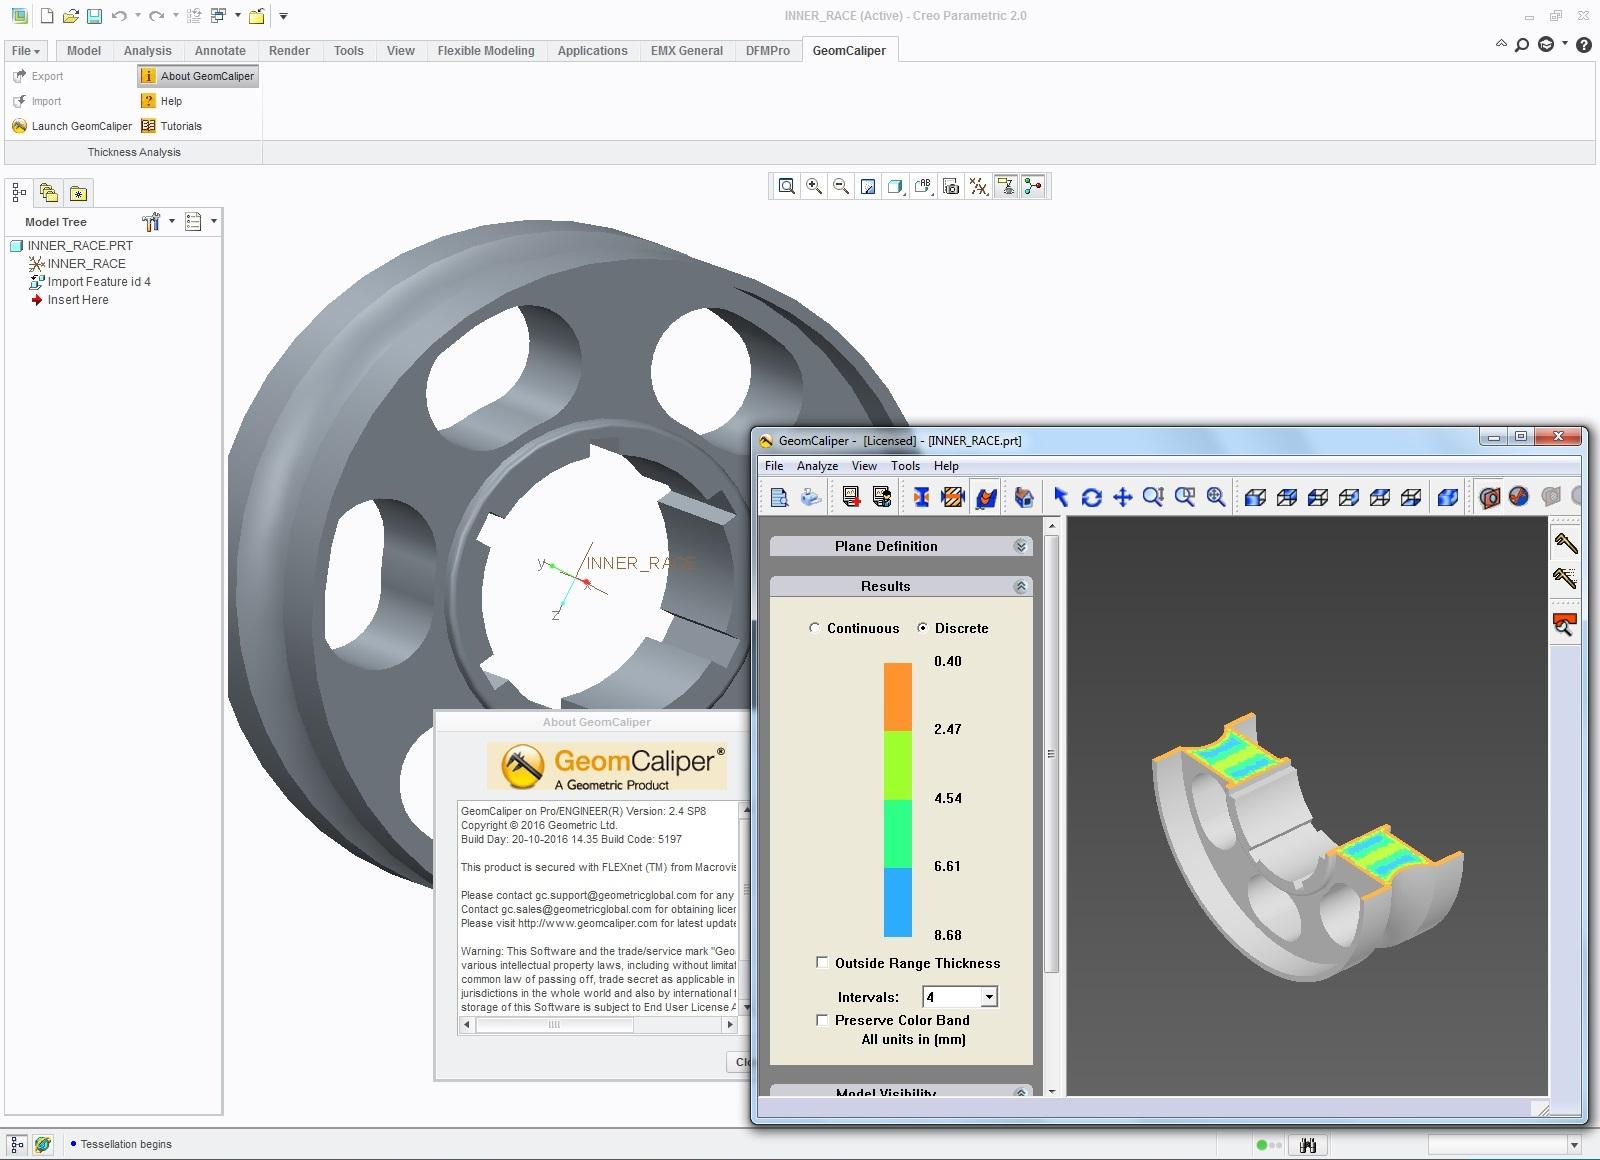 Geometric GeomCaliper 2.4 Build 5330 SP8 for ProEngineer-creo 1-3.0 full